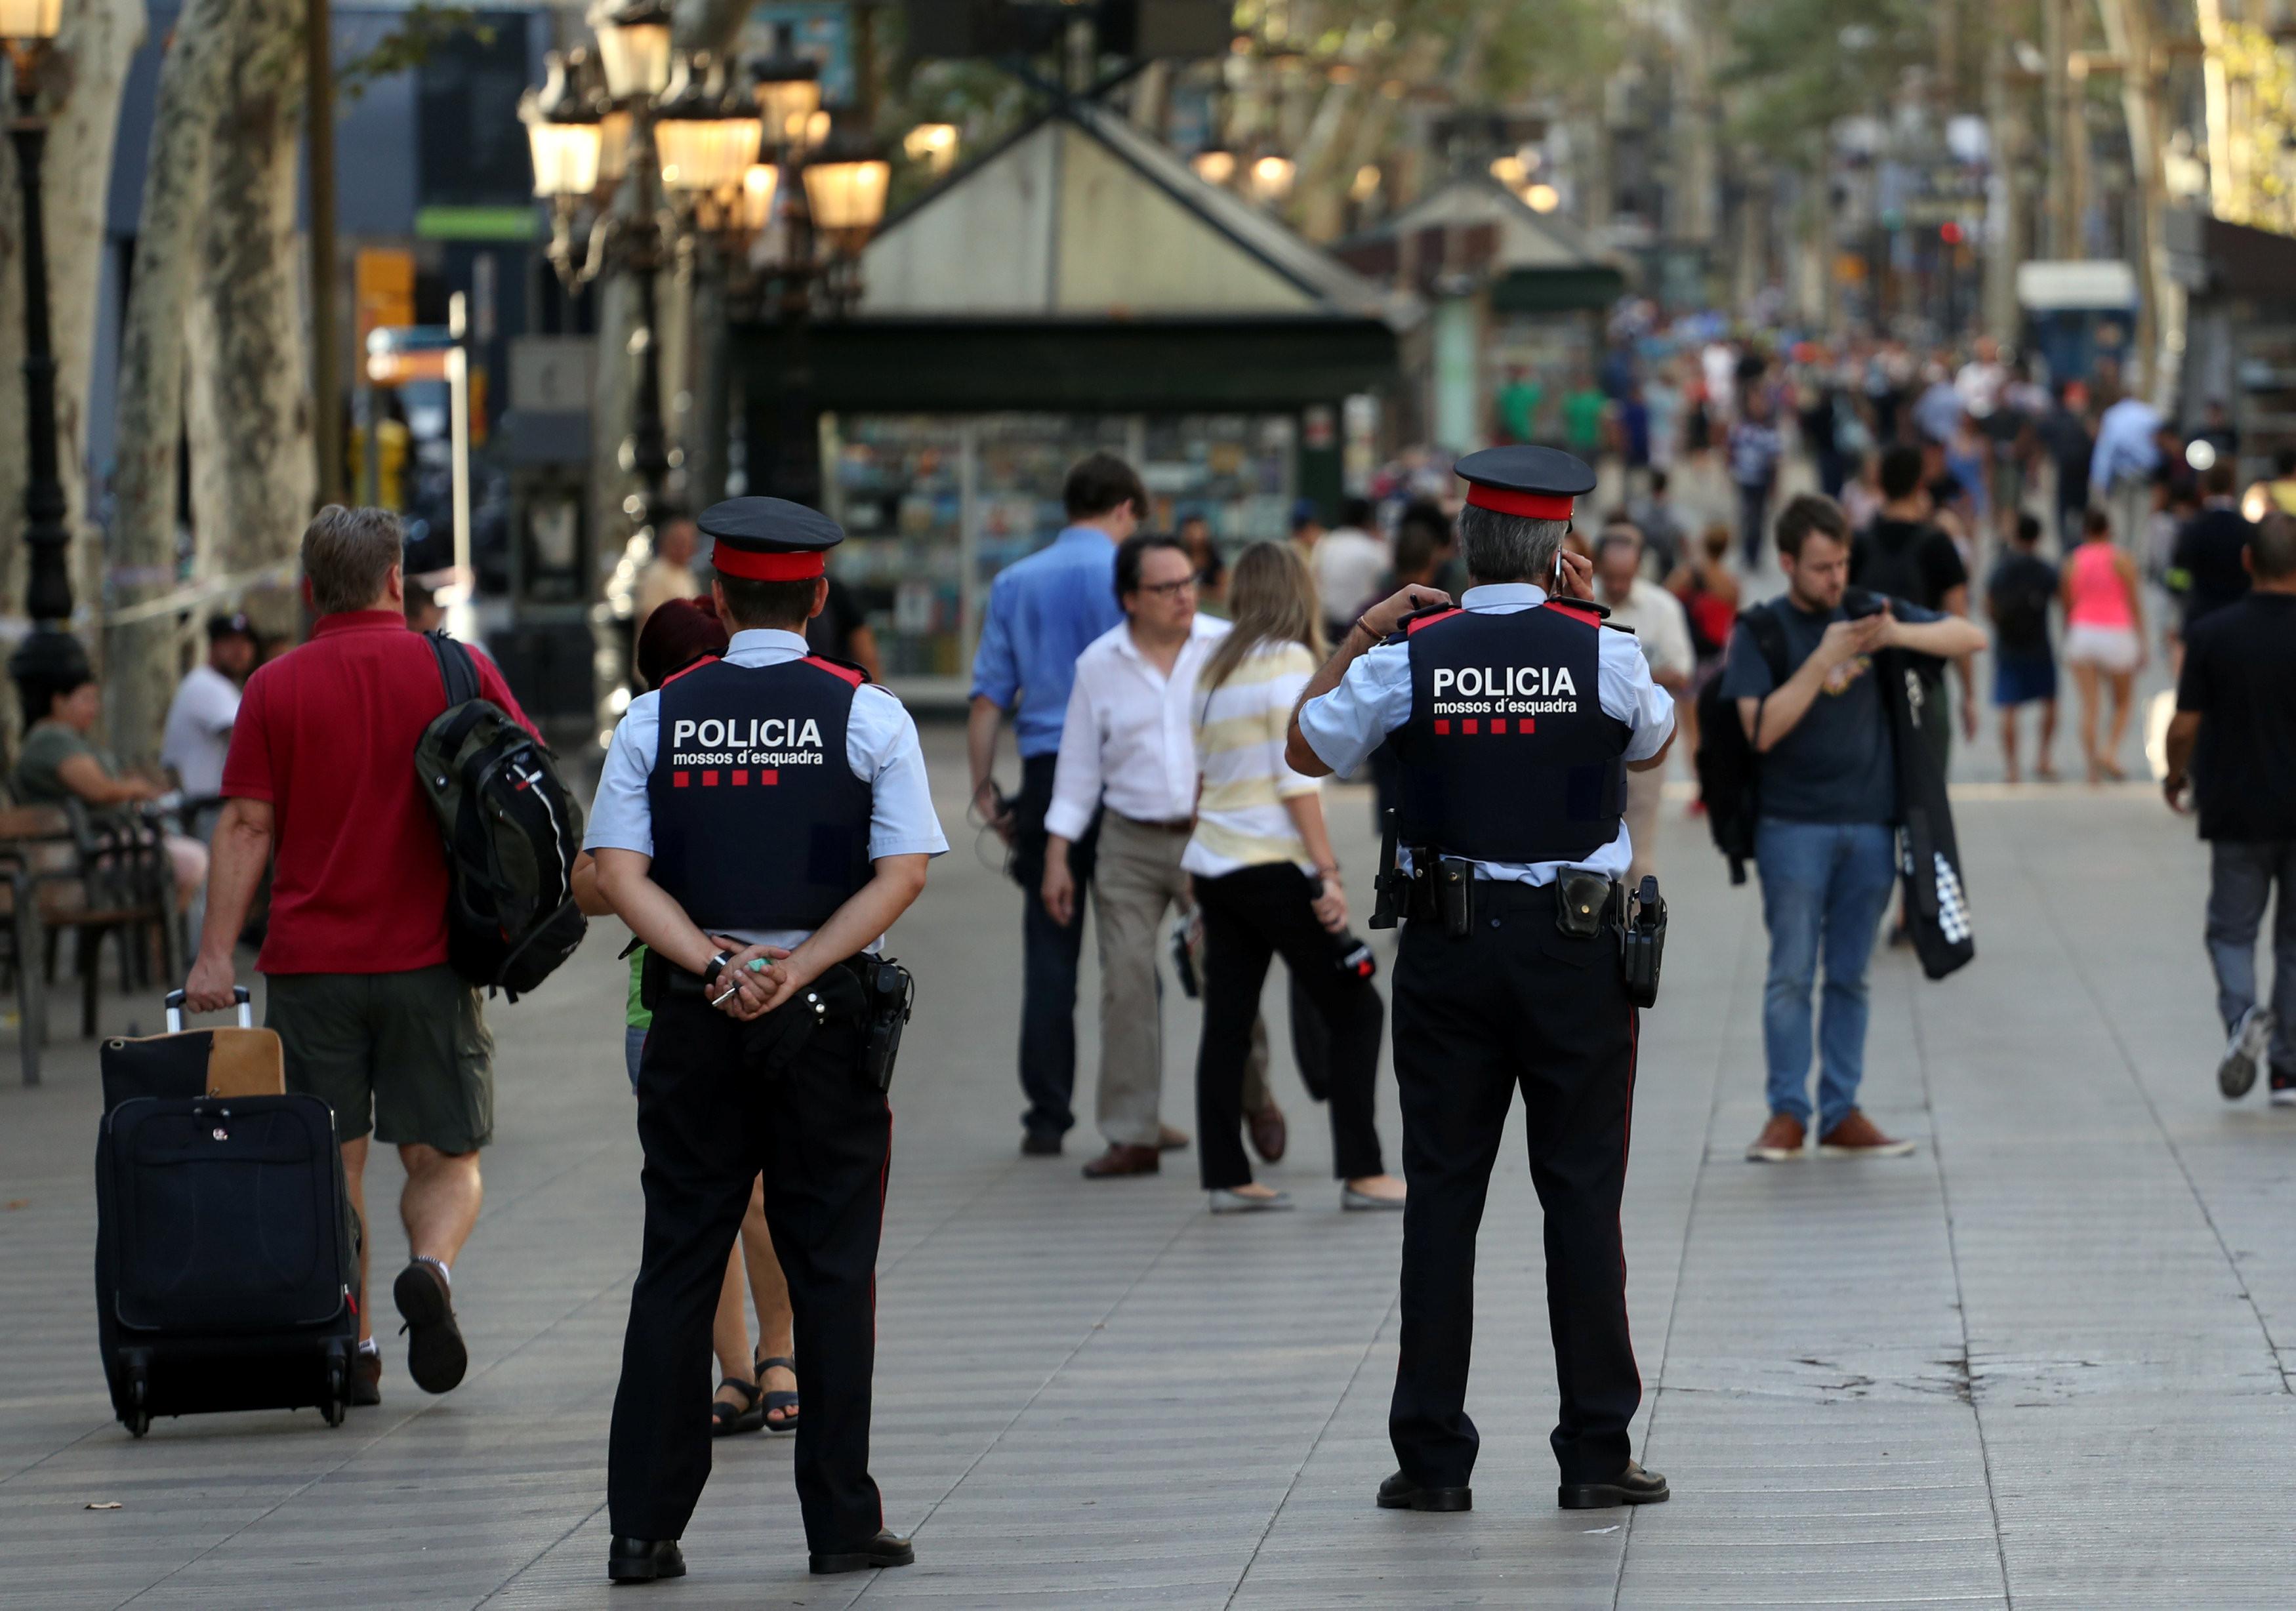 <p>Испанские полицейские. Фото: &copy; REUTERS/Sergio Perez</p>